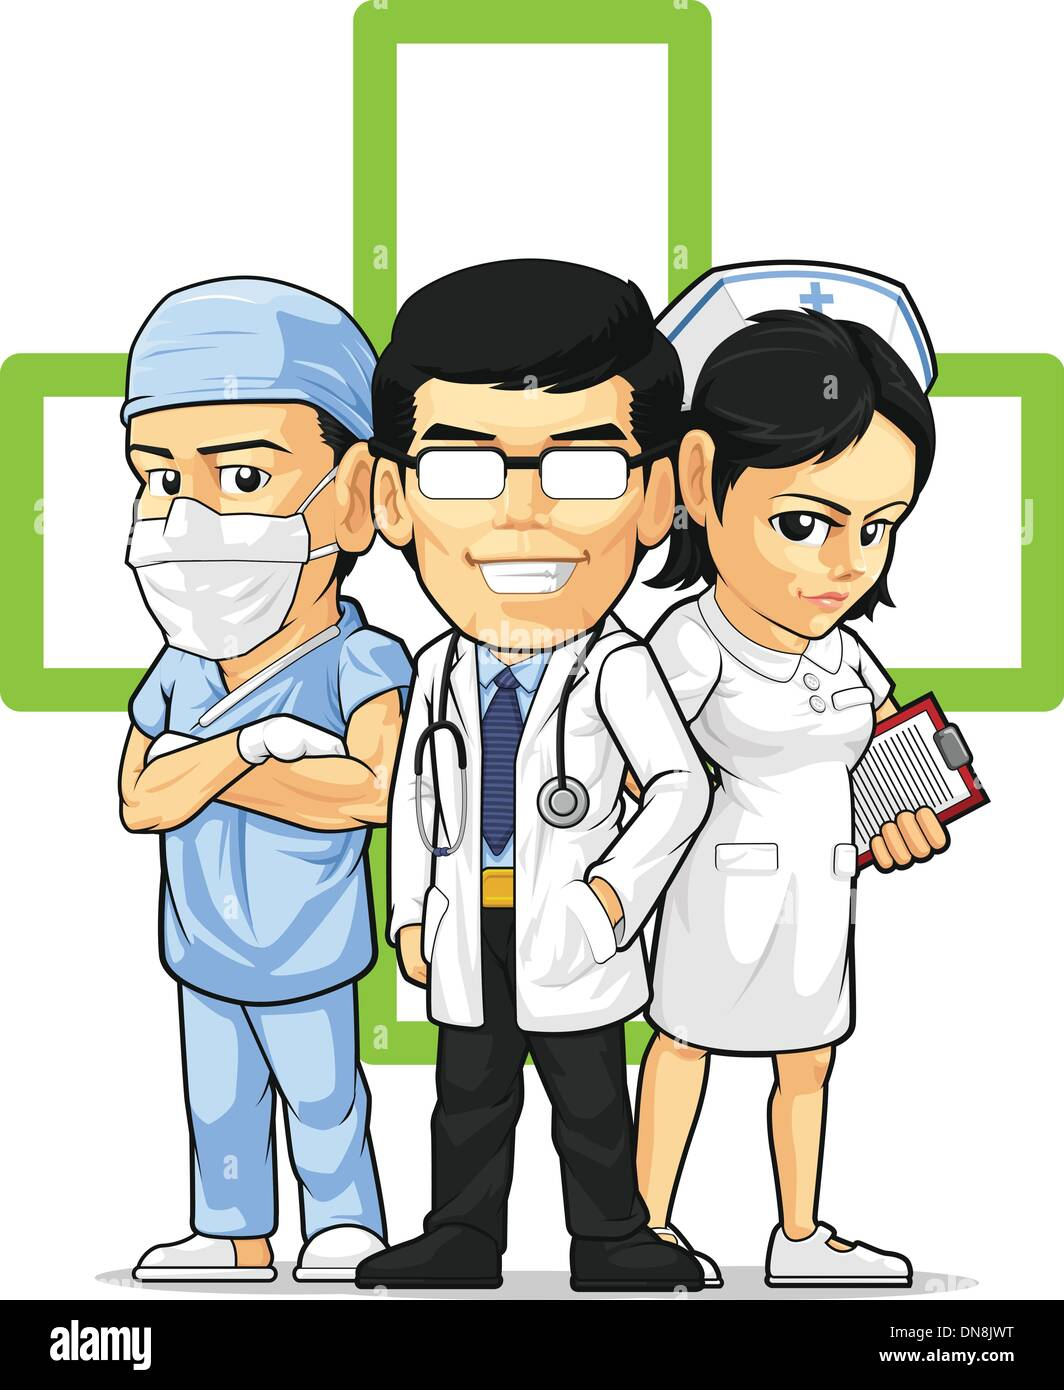 Health Care or Medical Staff - Doctor, Nurse, & Surgeon - Stock Image